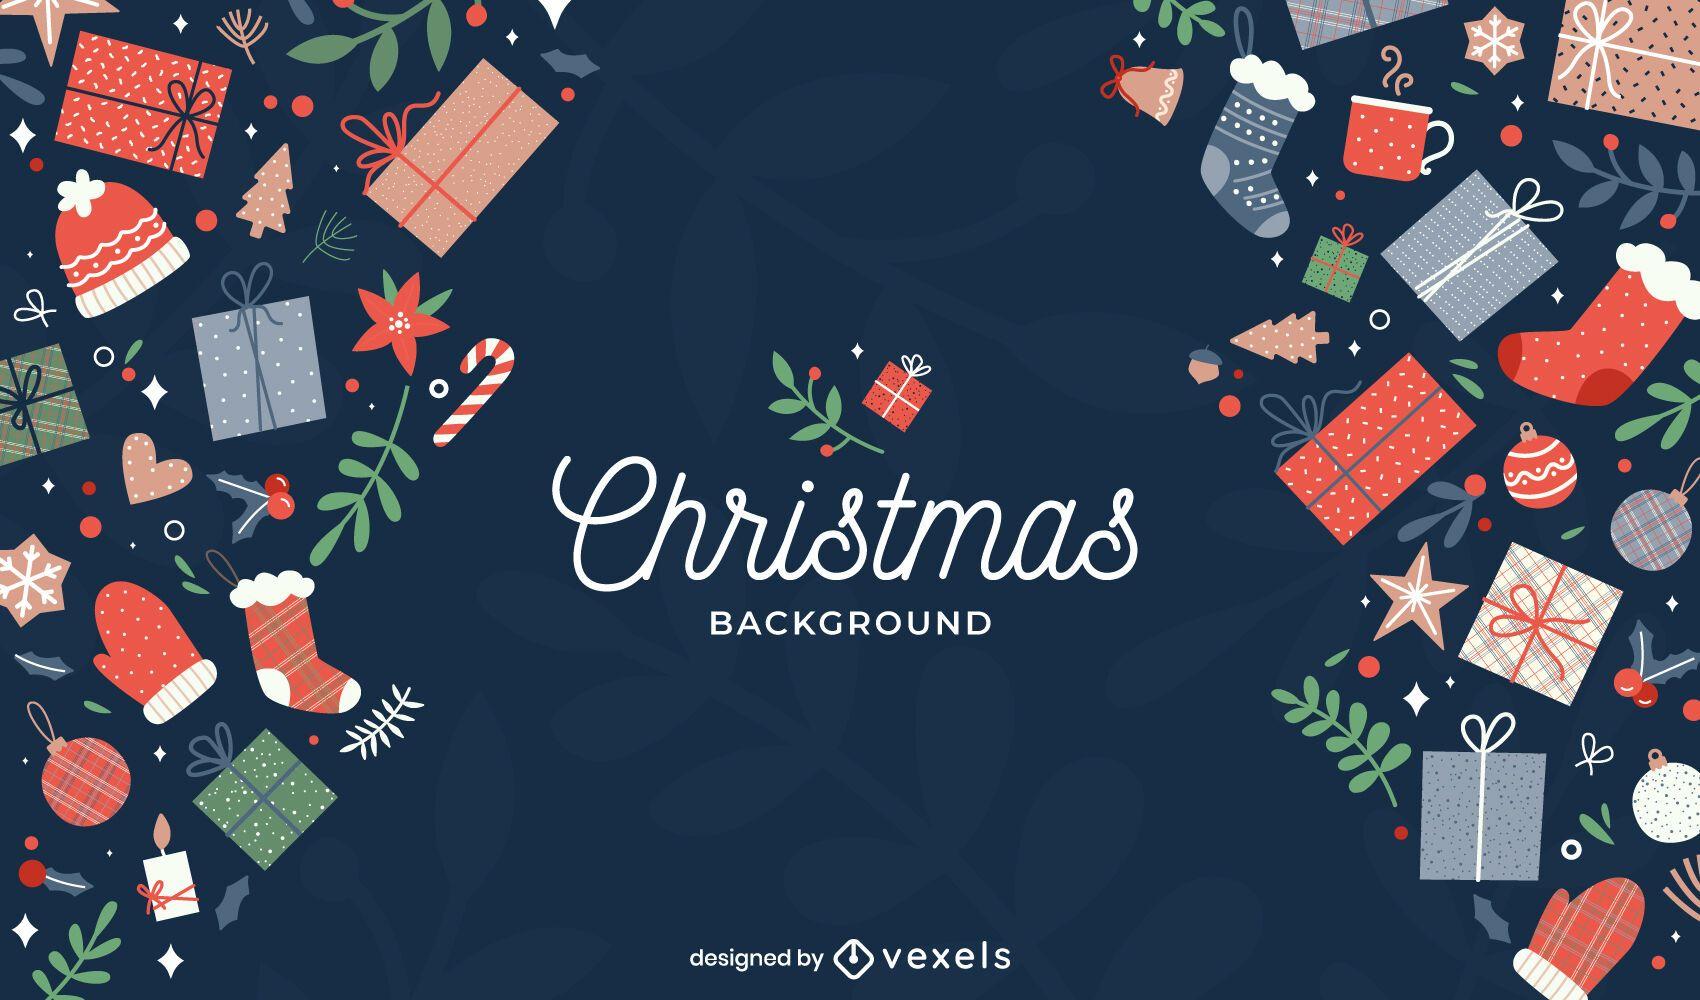 Presents christmas background design